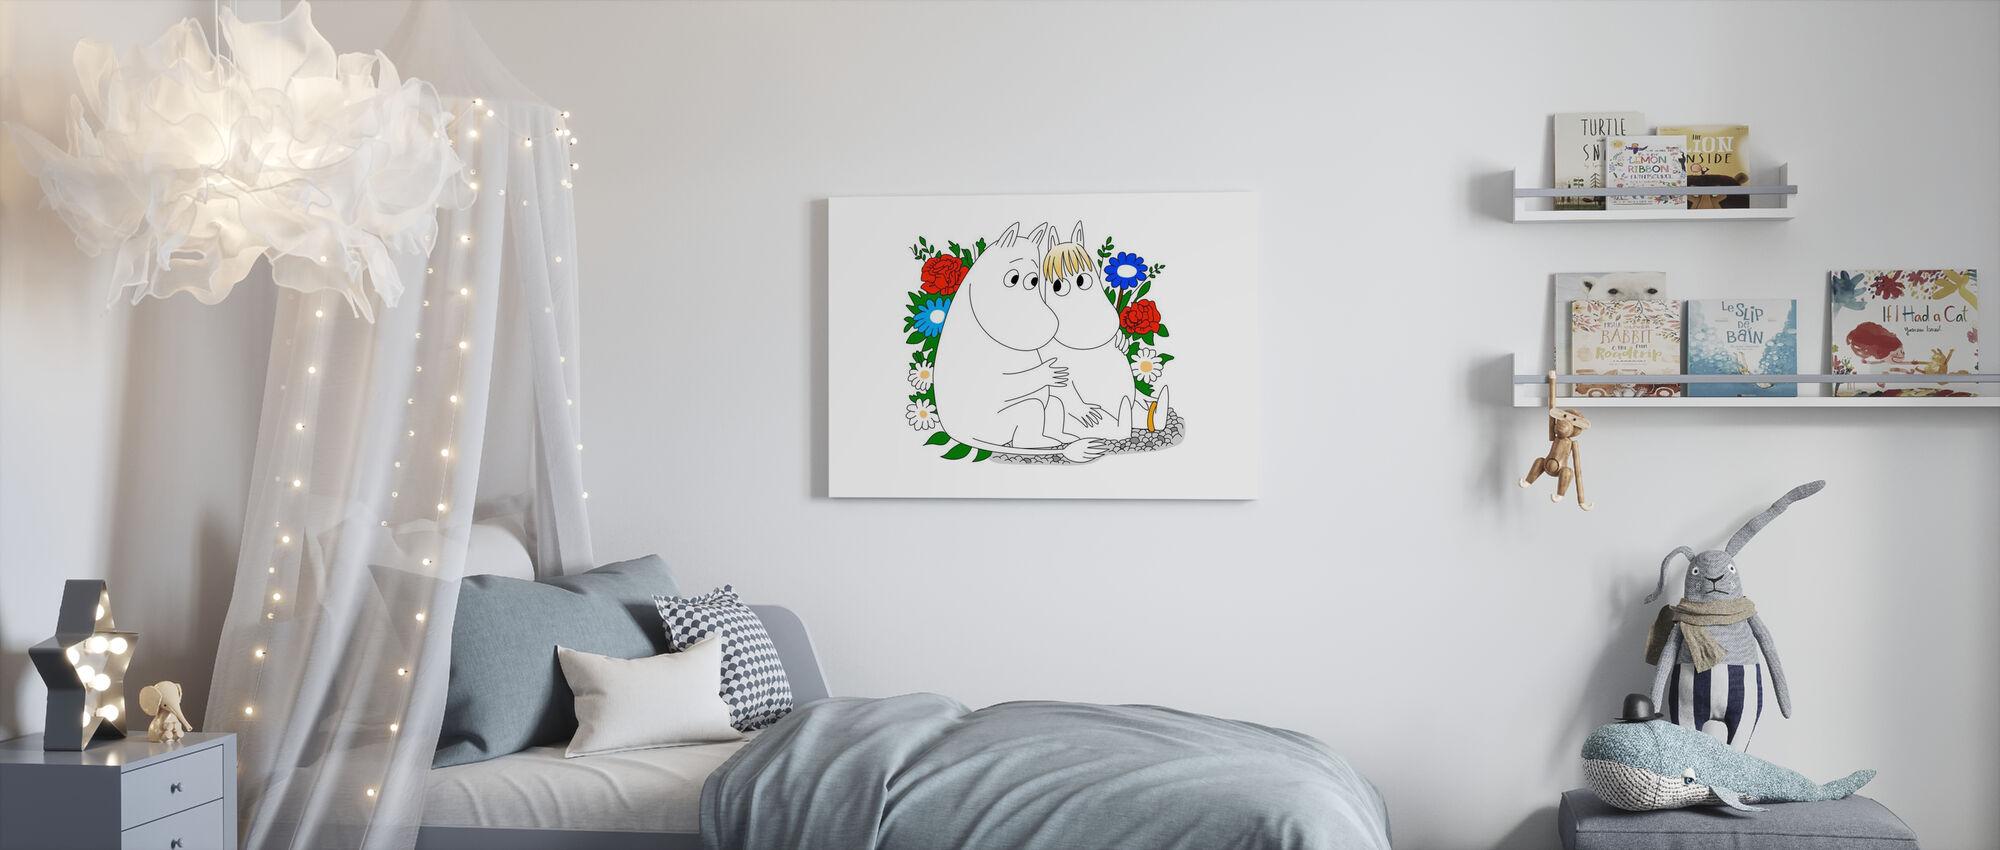 Mumin - Snorkjungfrun - Canvastavla - Barnrum